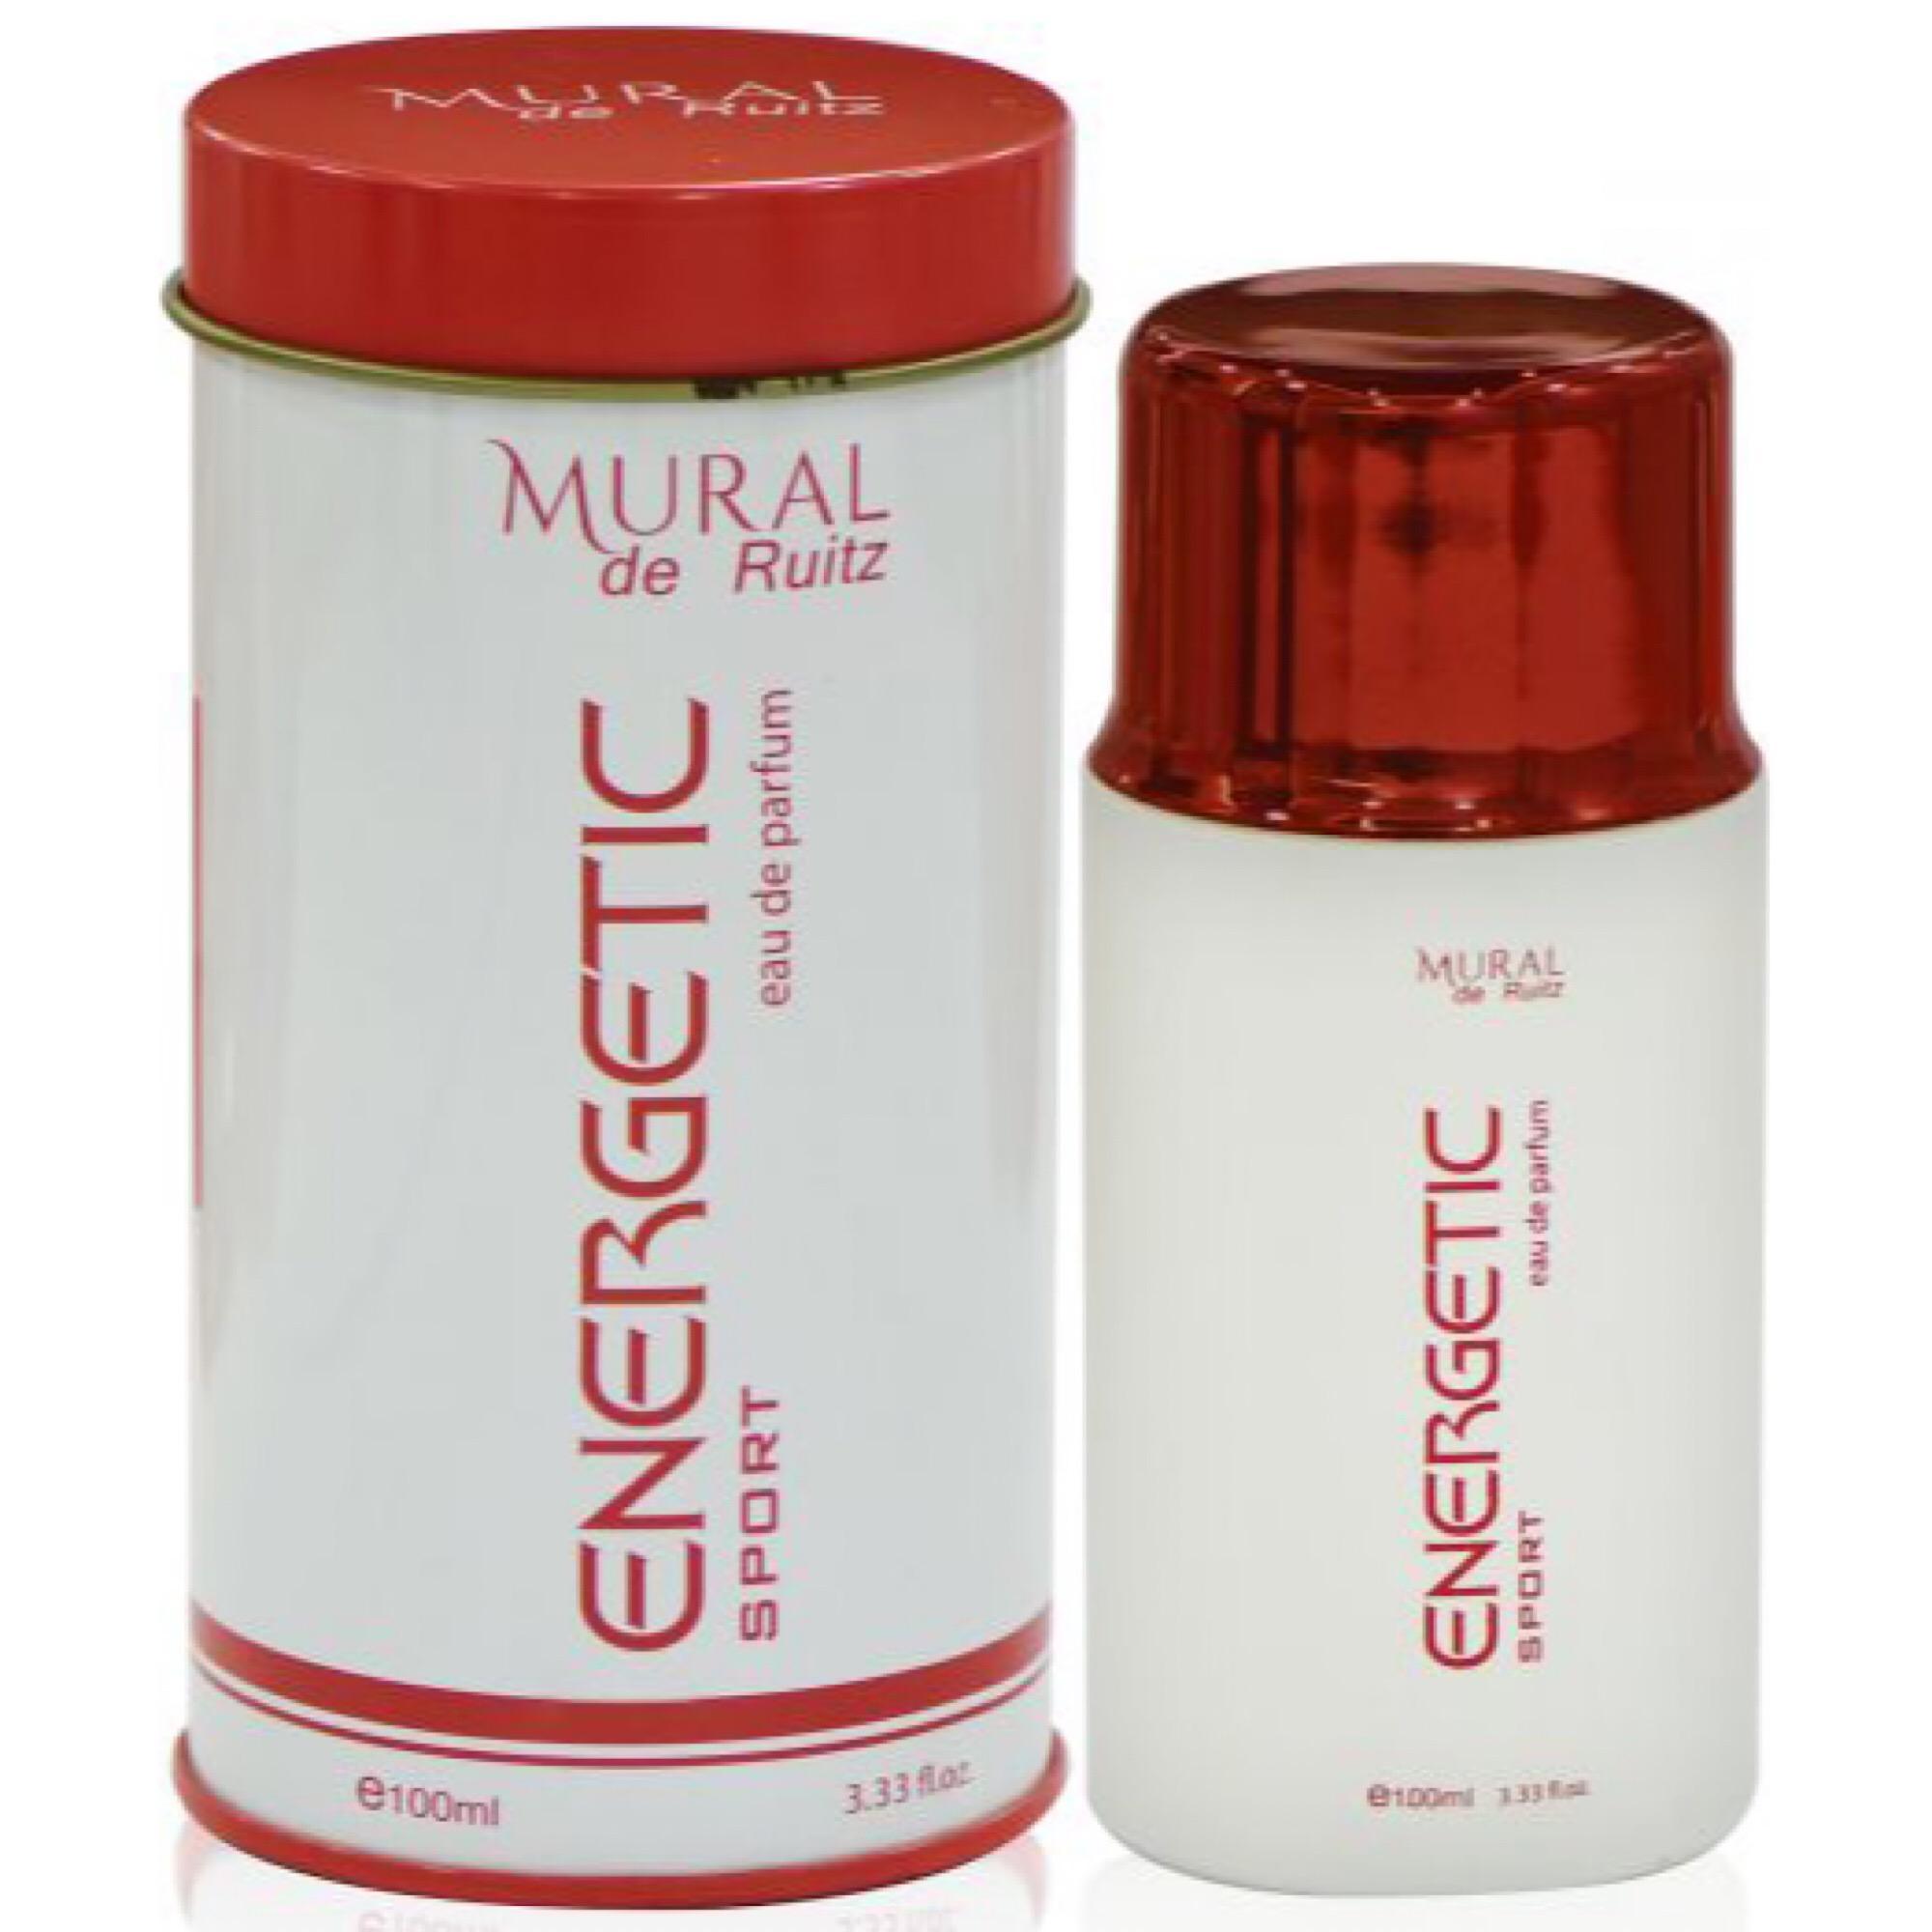 467a1ce8859 Buy mural Men s Fragrances at Best Prices Online in Pakistan - daraz.pk